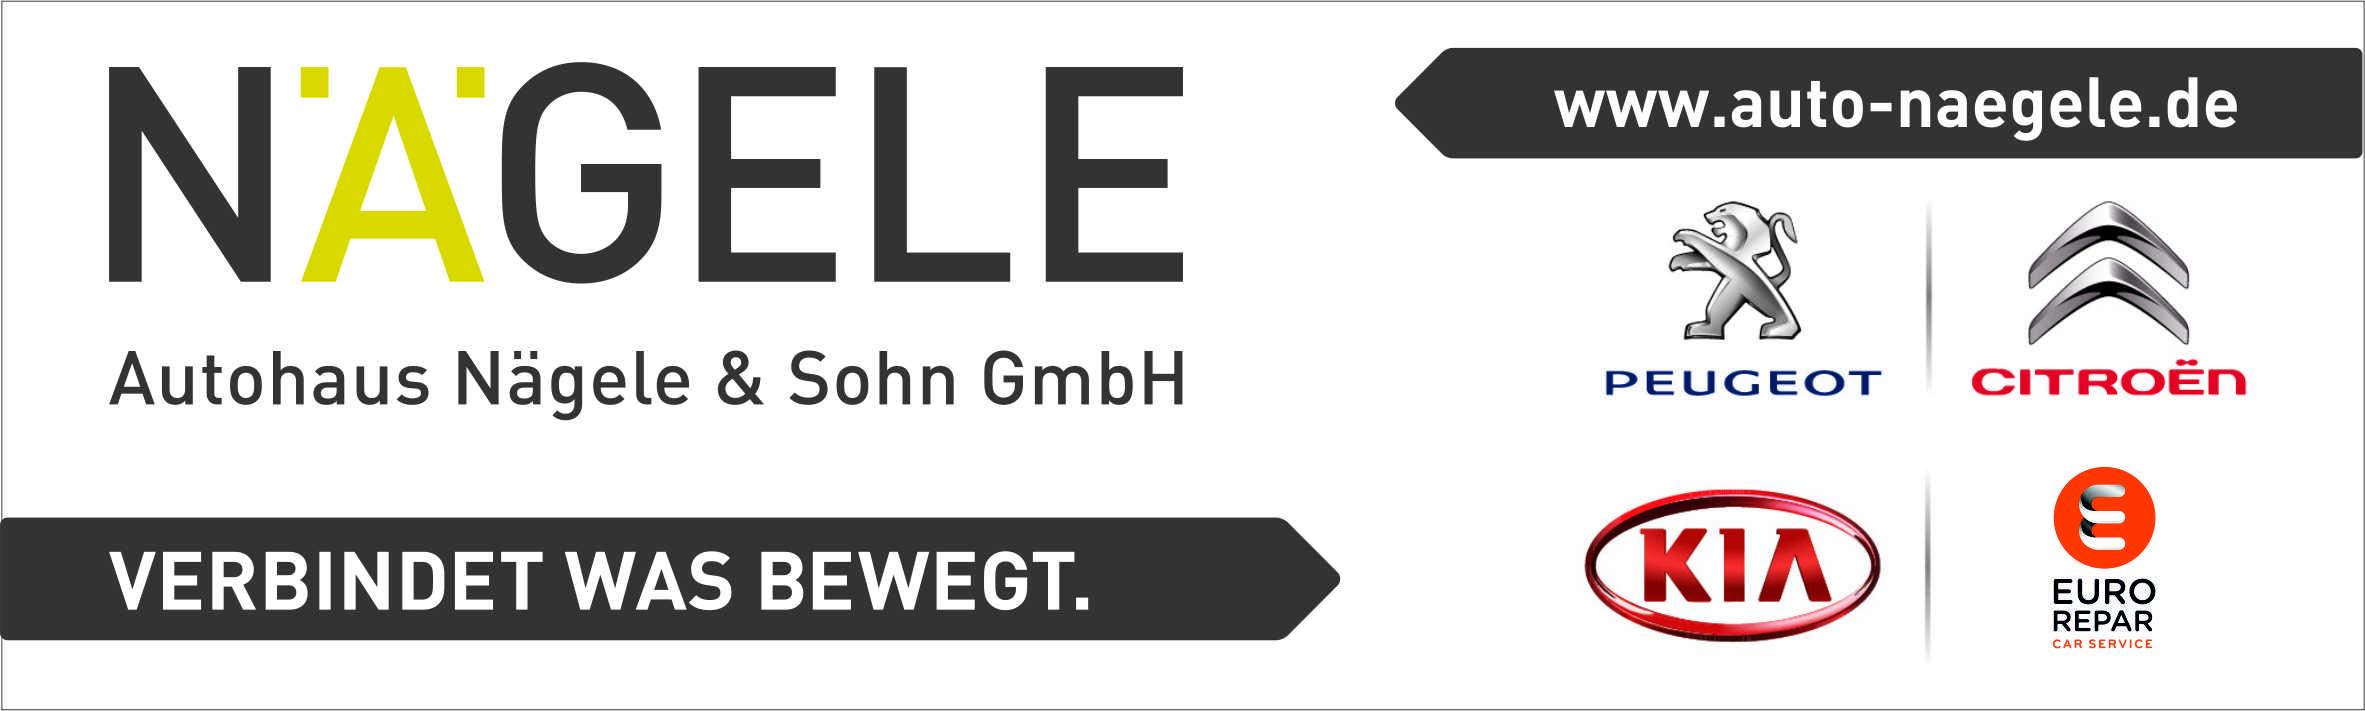 Autohaus Nägele & Sohn GmbH